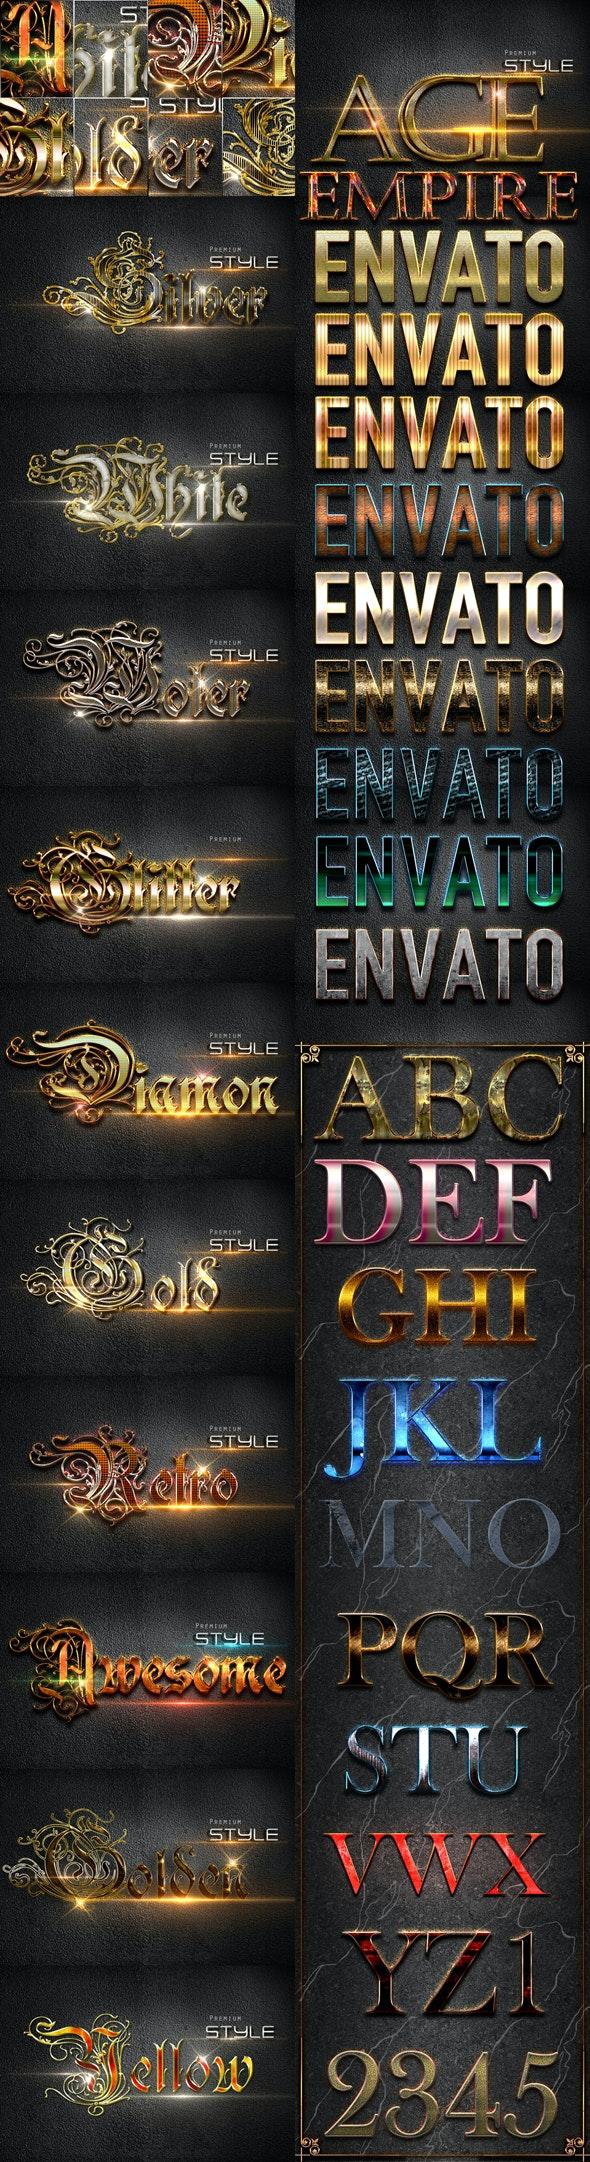 30 Bundle 3D Text Styles D25-D27 - Styles Photoshop